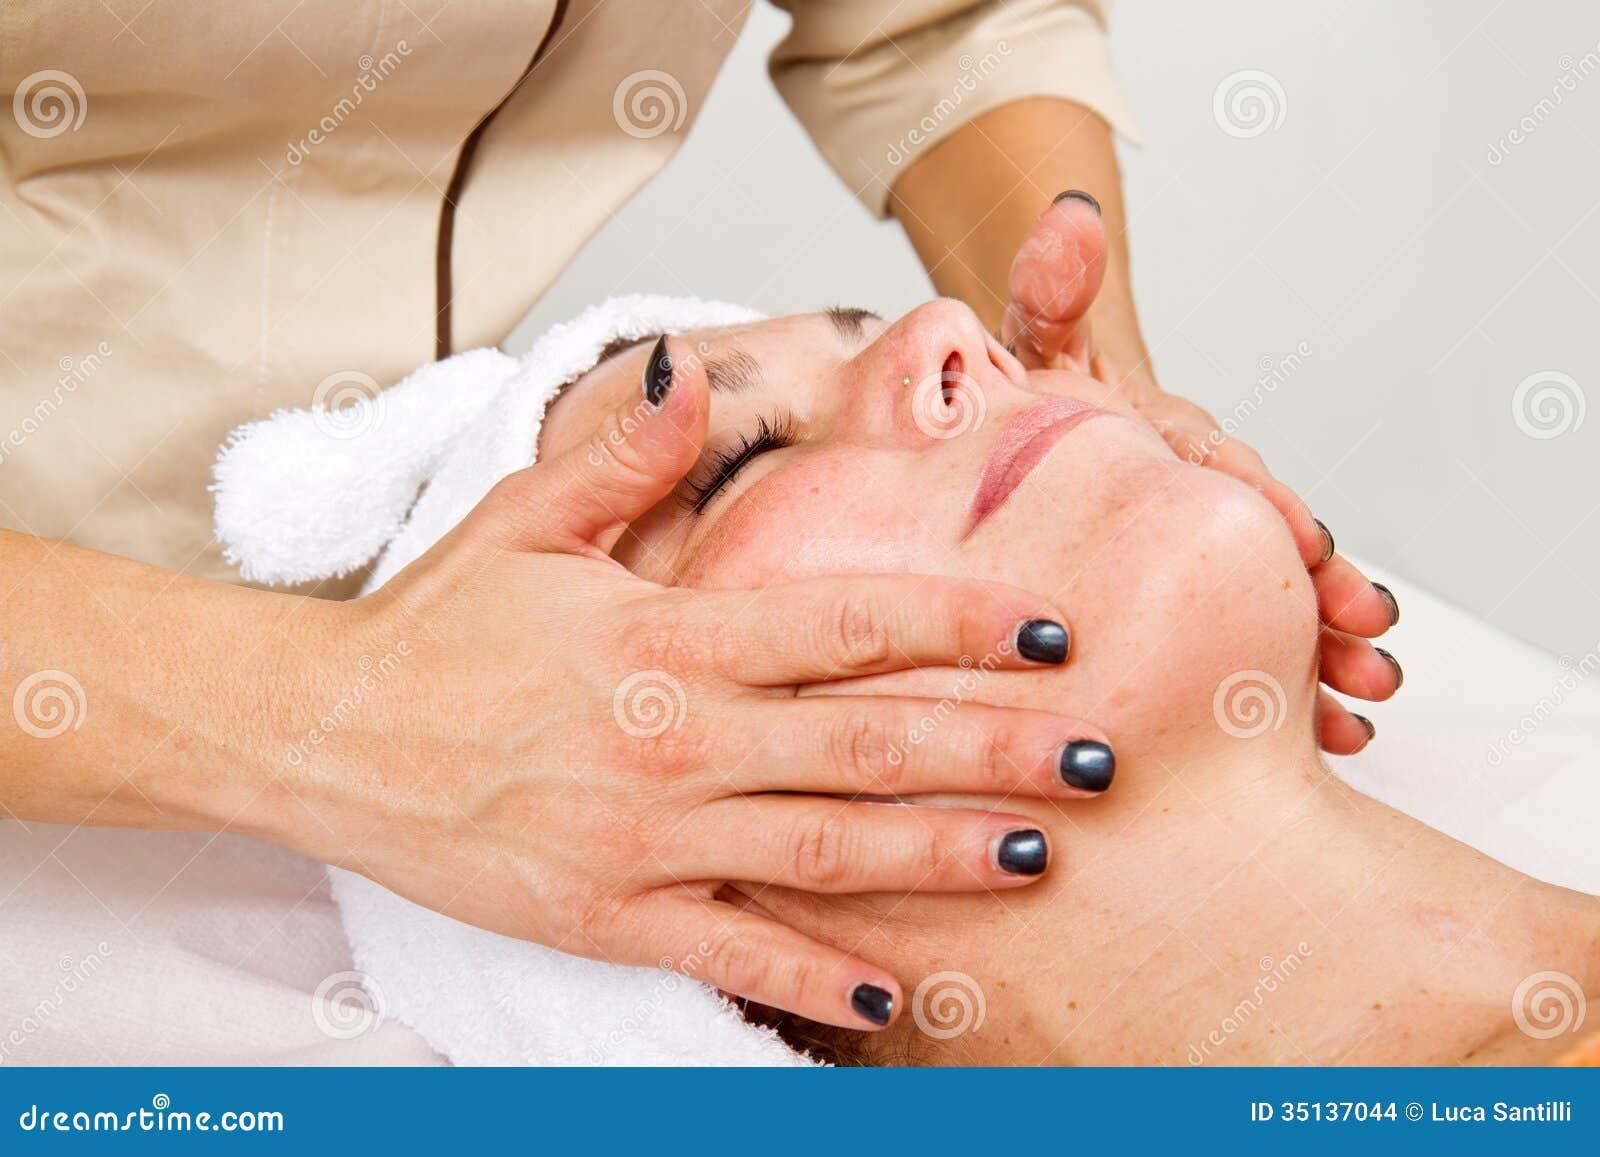 holstebro sex massage holbæk